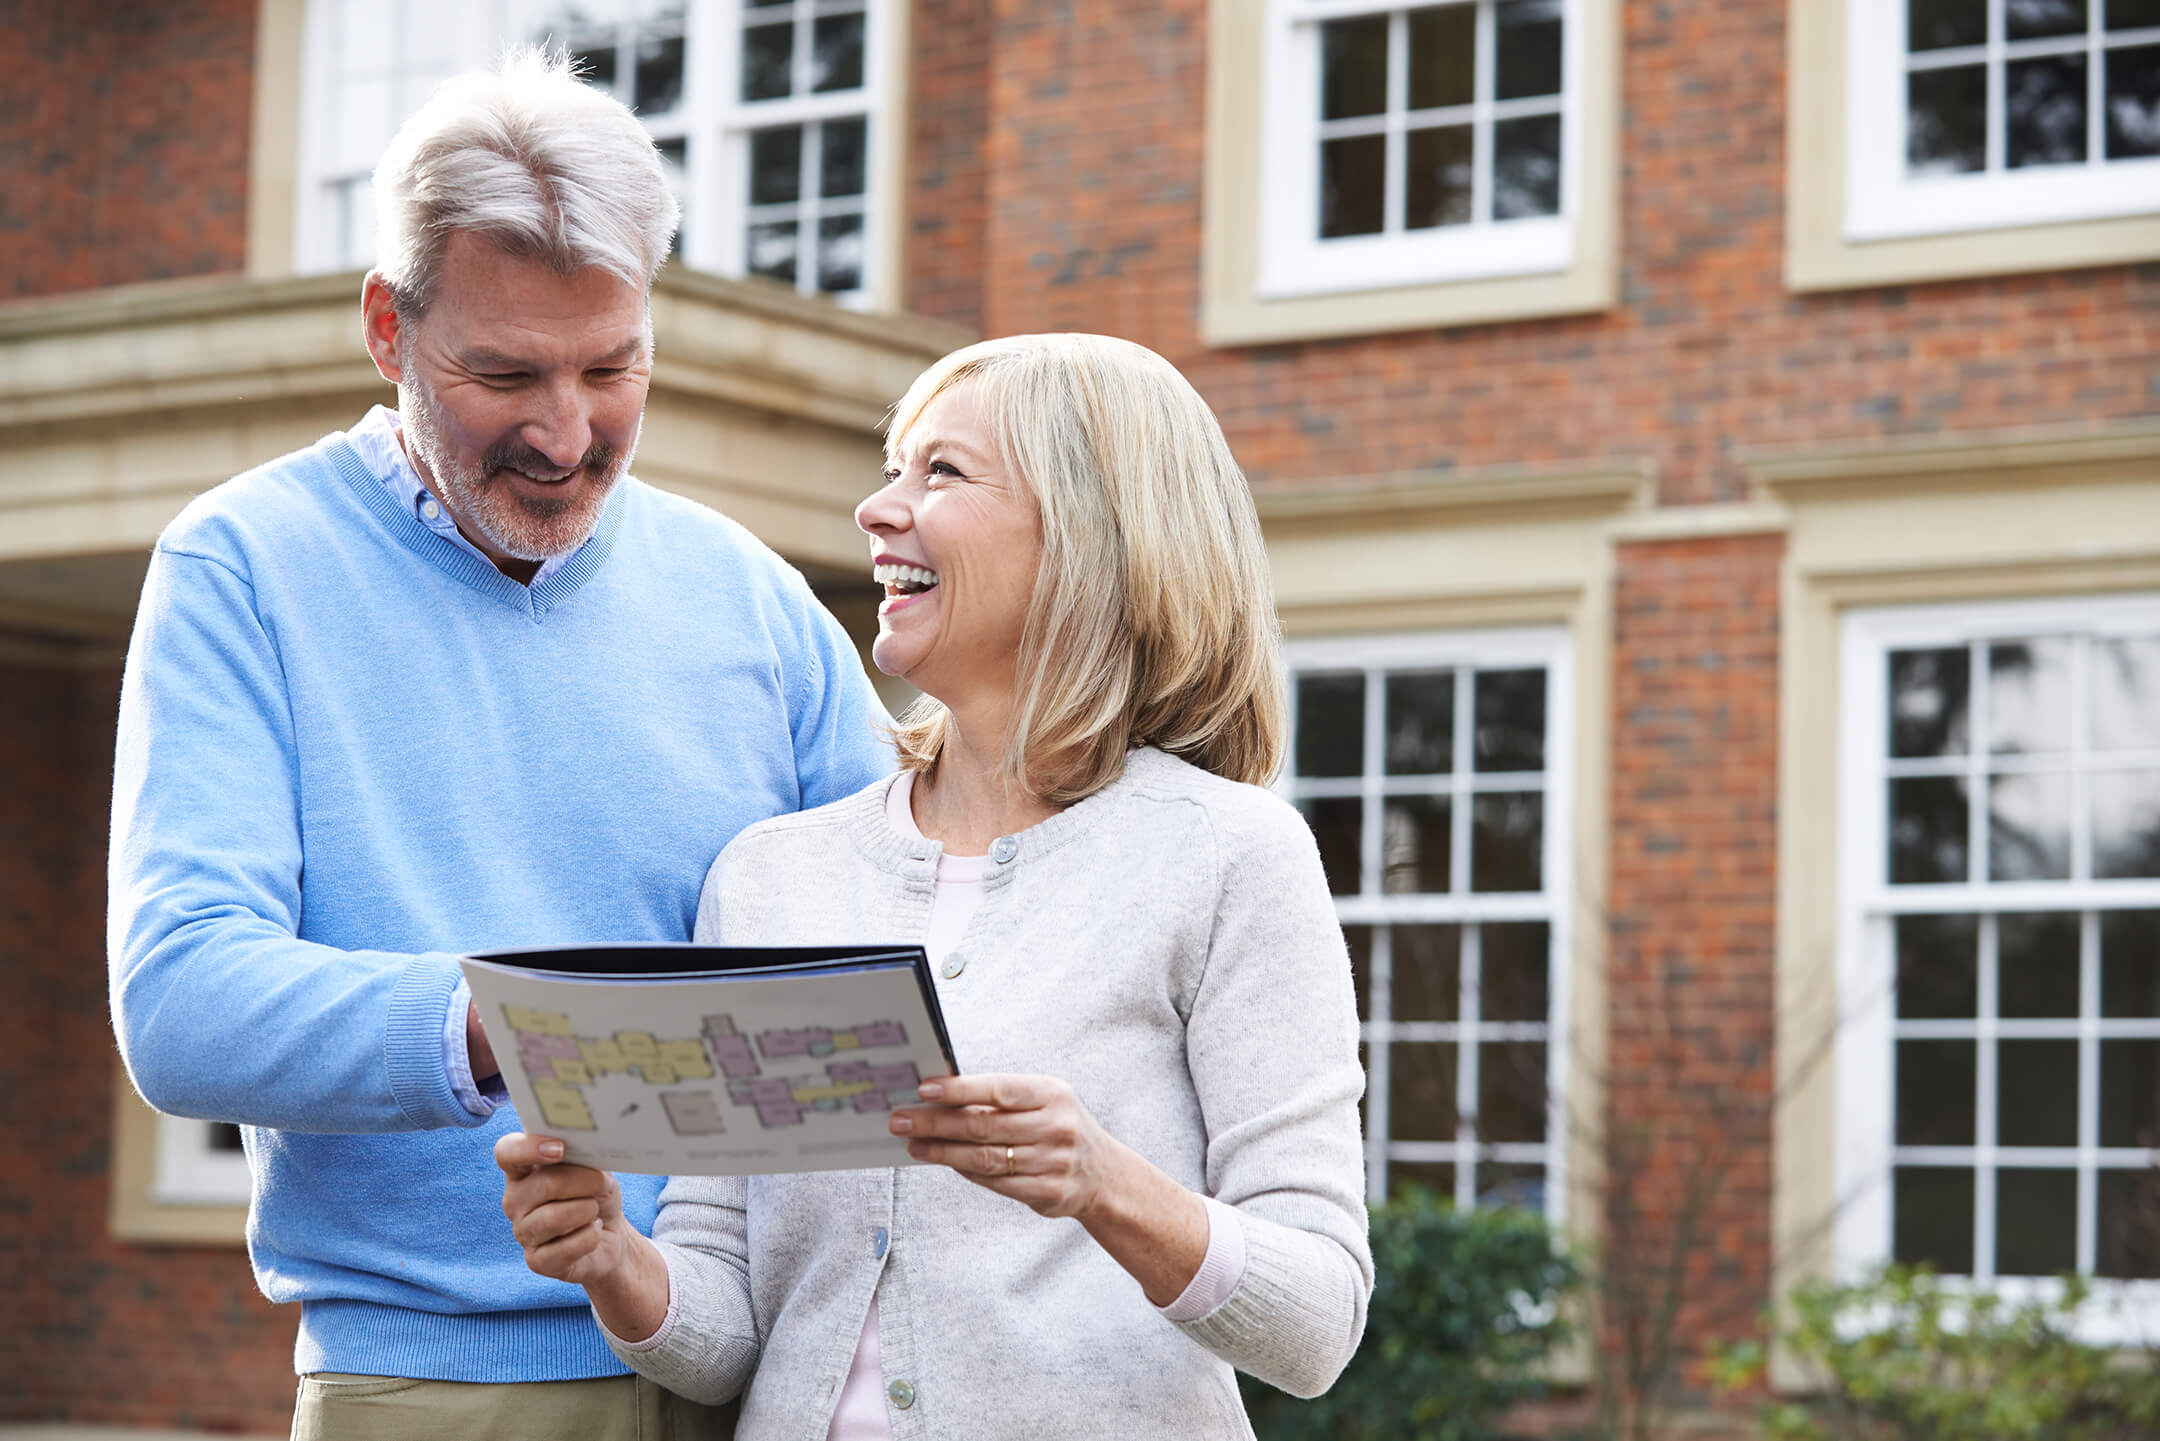 Real Estate Social Media Content Ideas: Using UGC